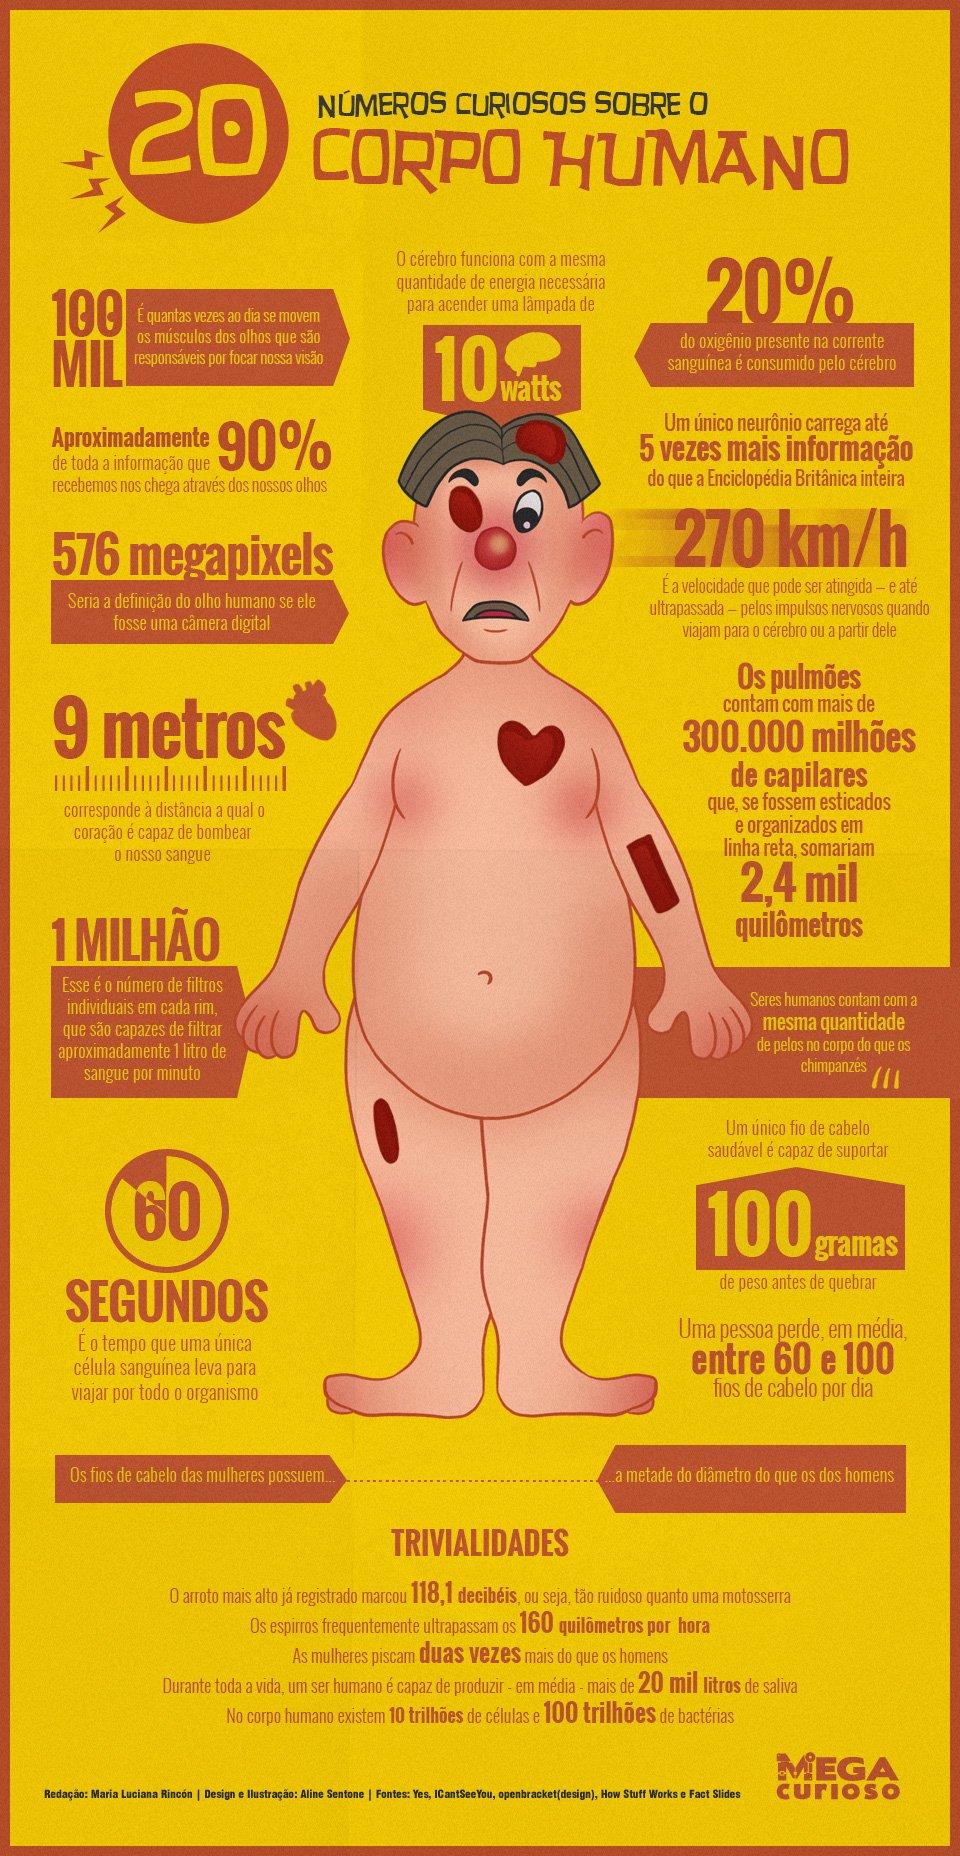 20 números curiosos sobre o funcionamento do corpo humano [infográfico]